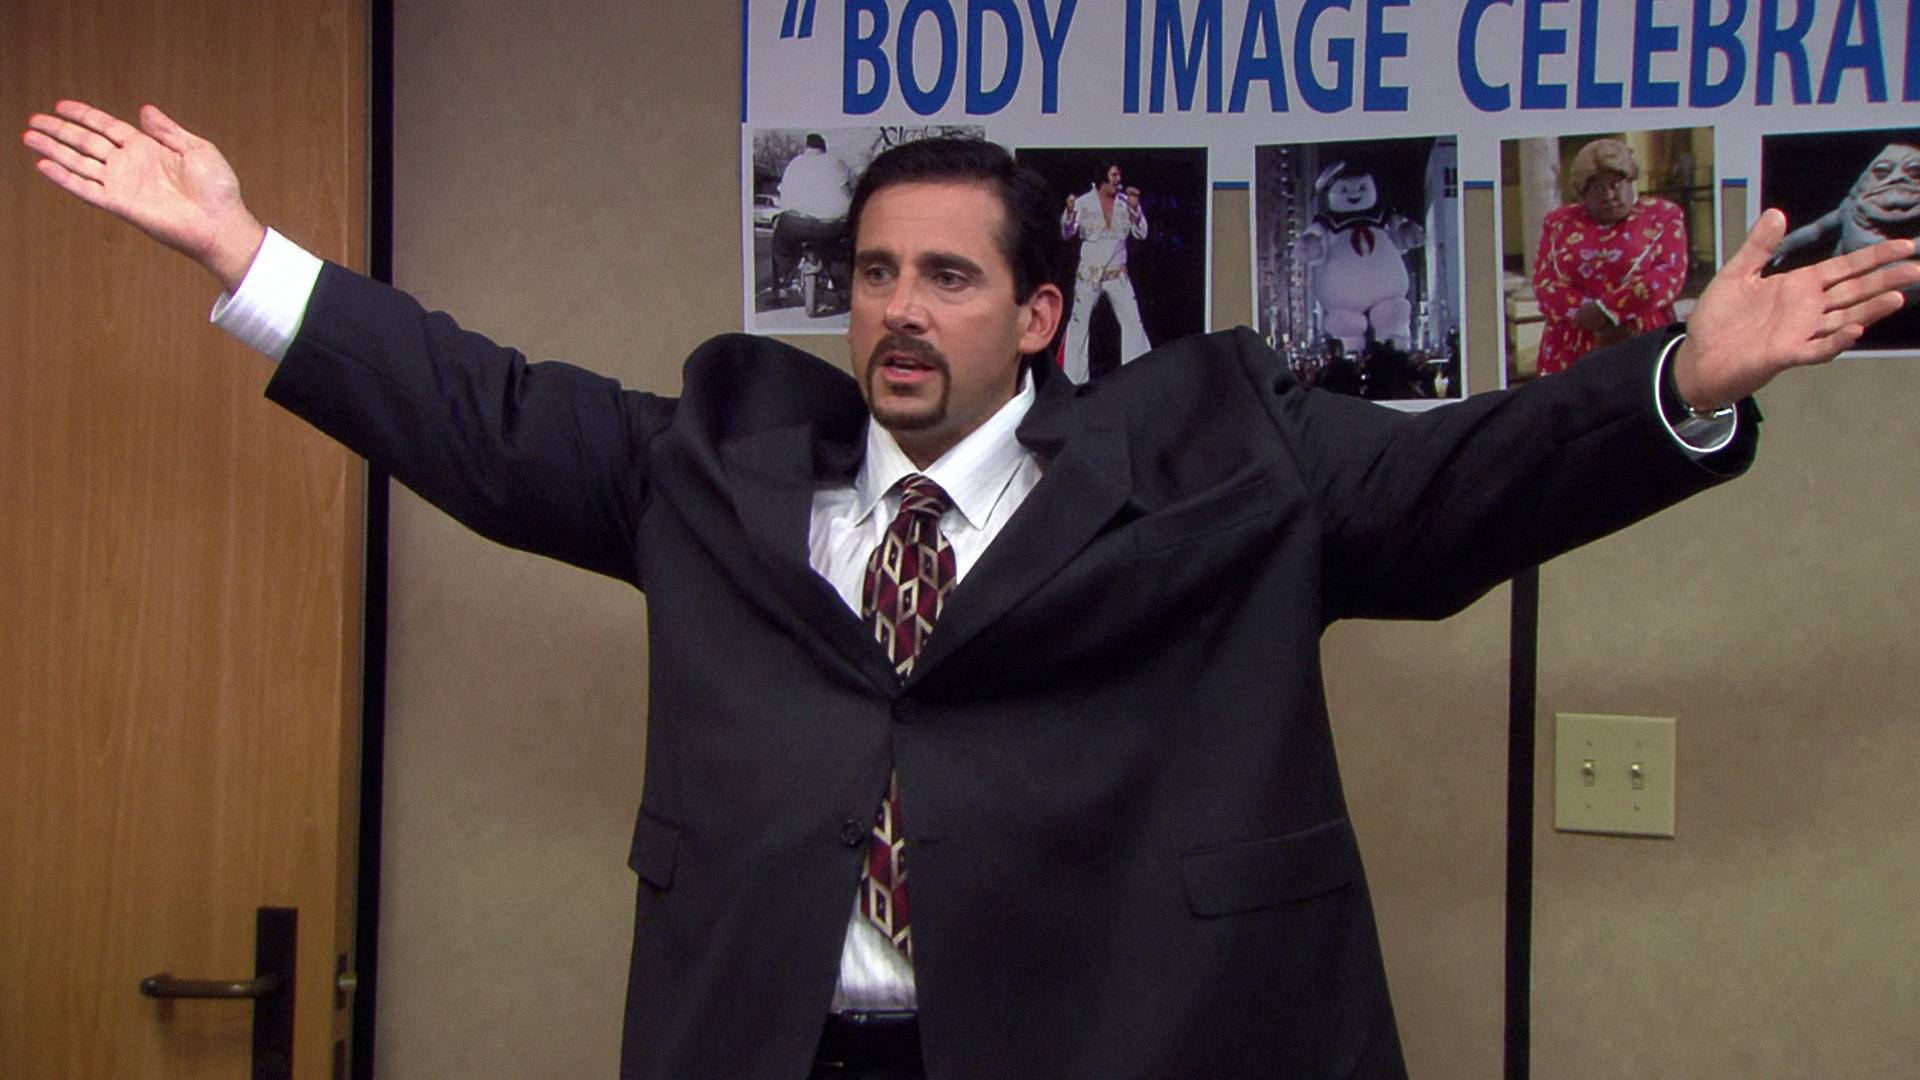 The Office Season 5 Episode 2